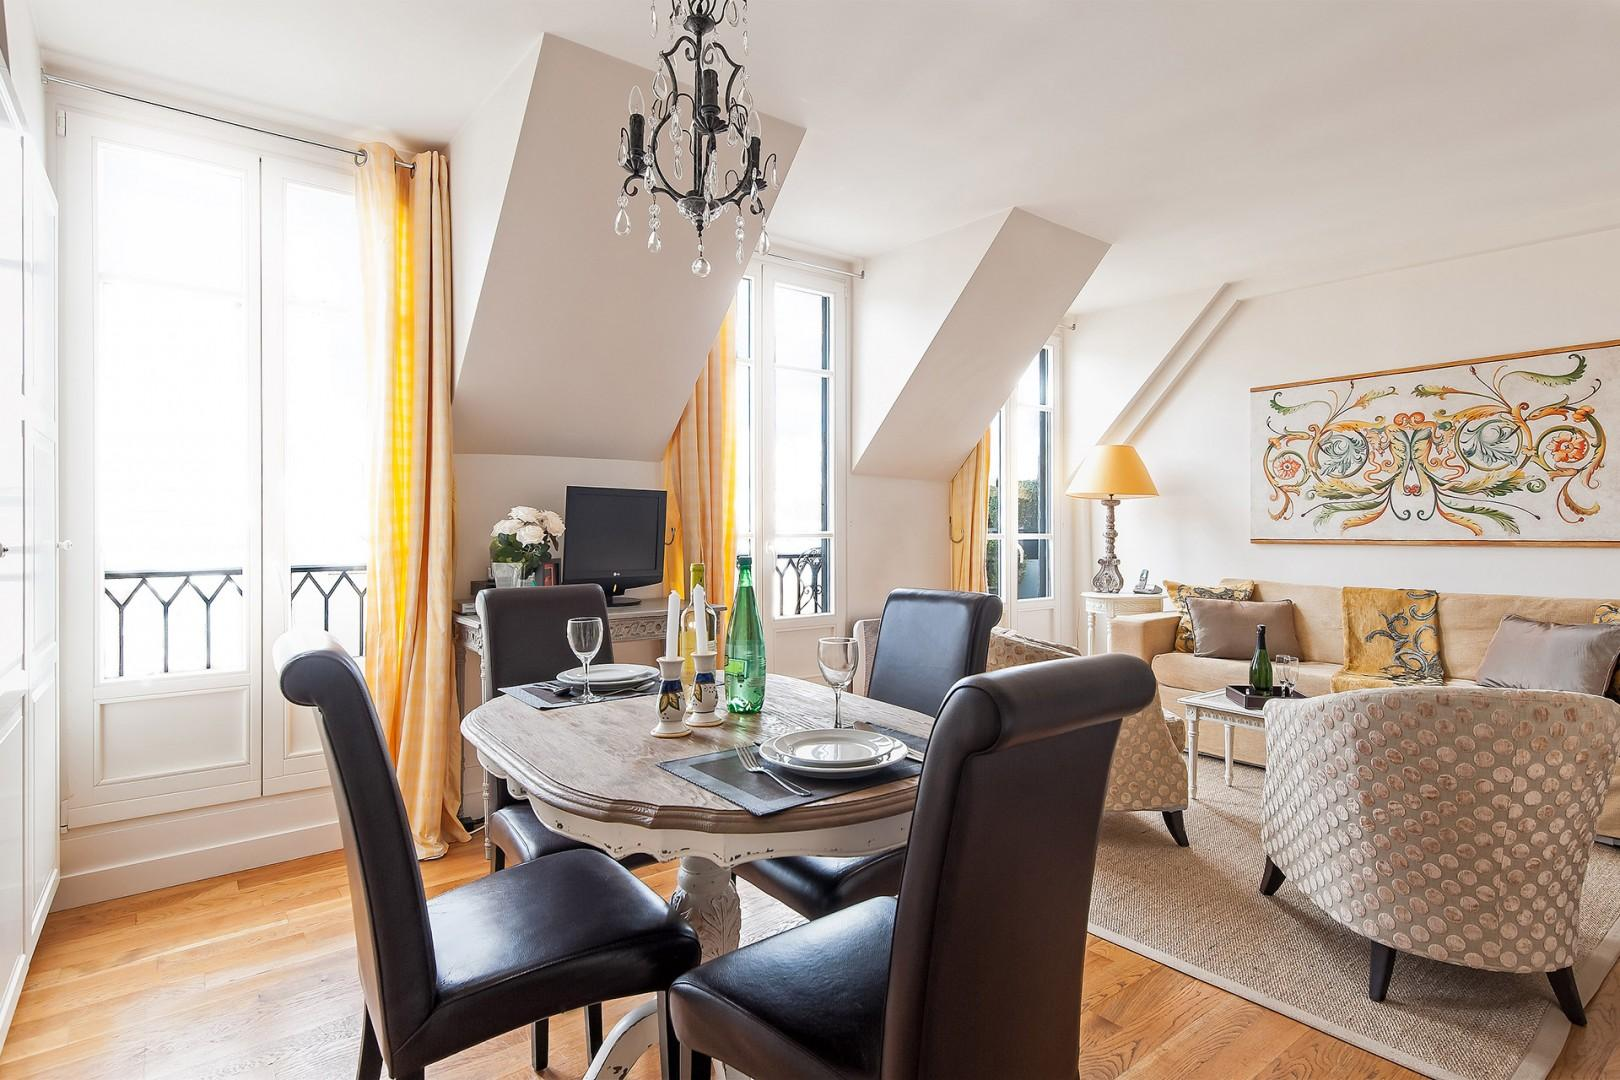 Enjoy the rental's open floorplan and airy feel.